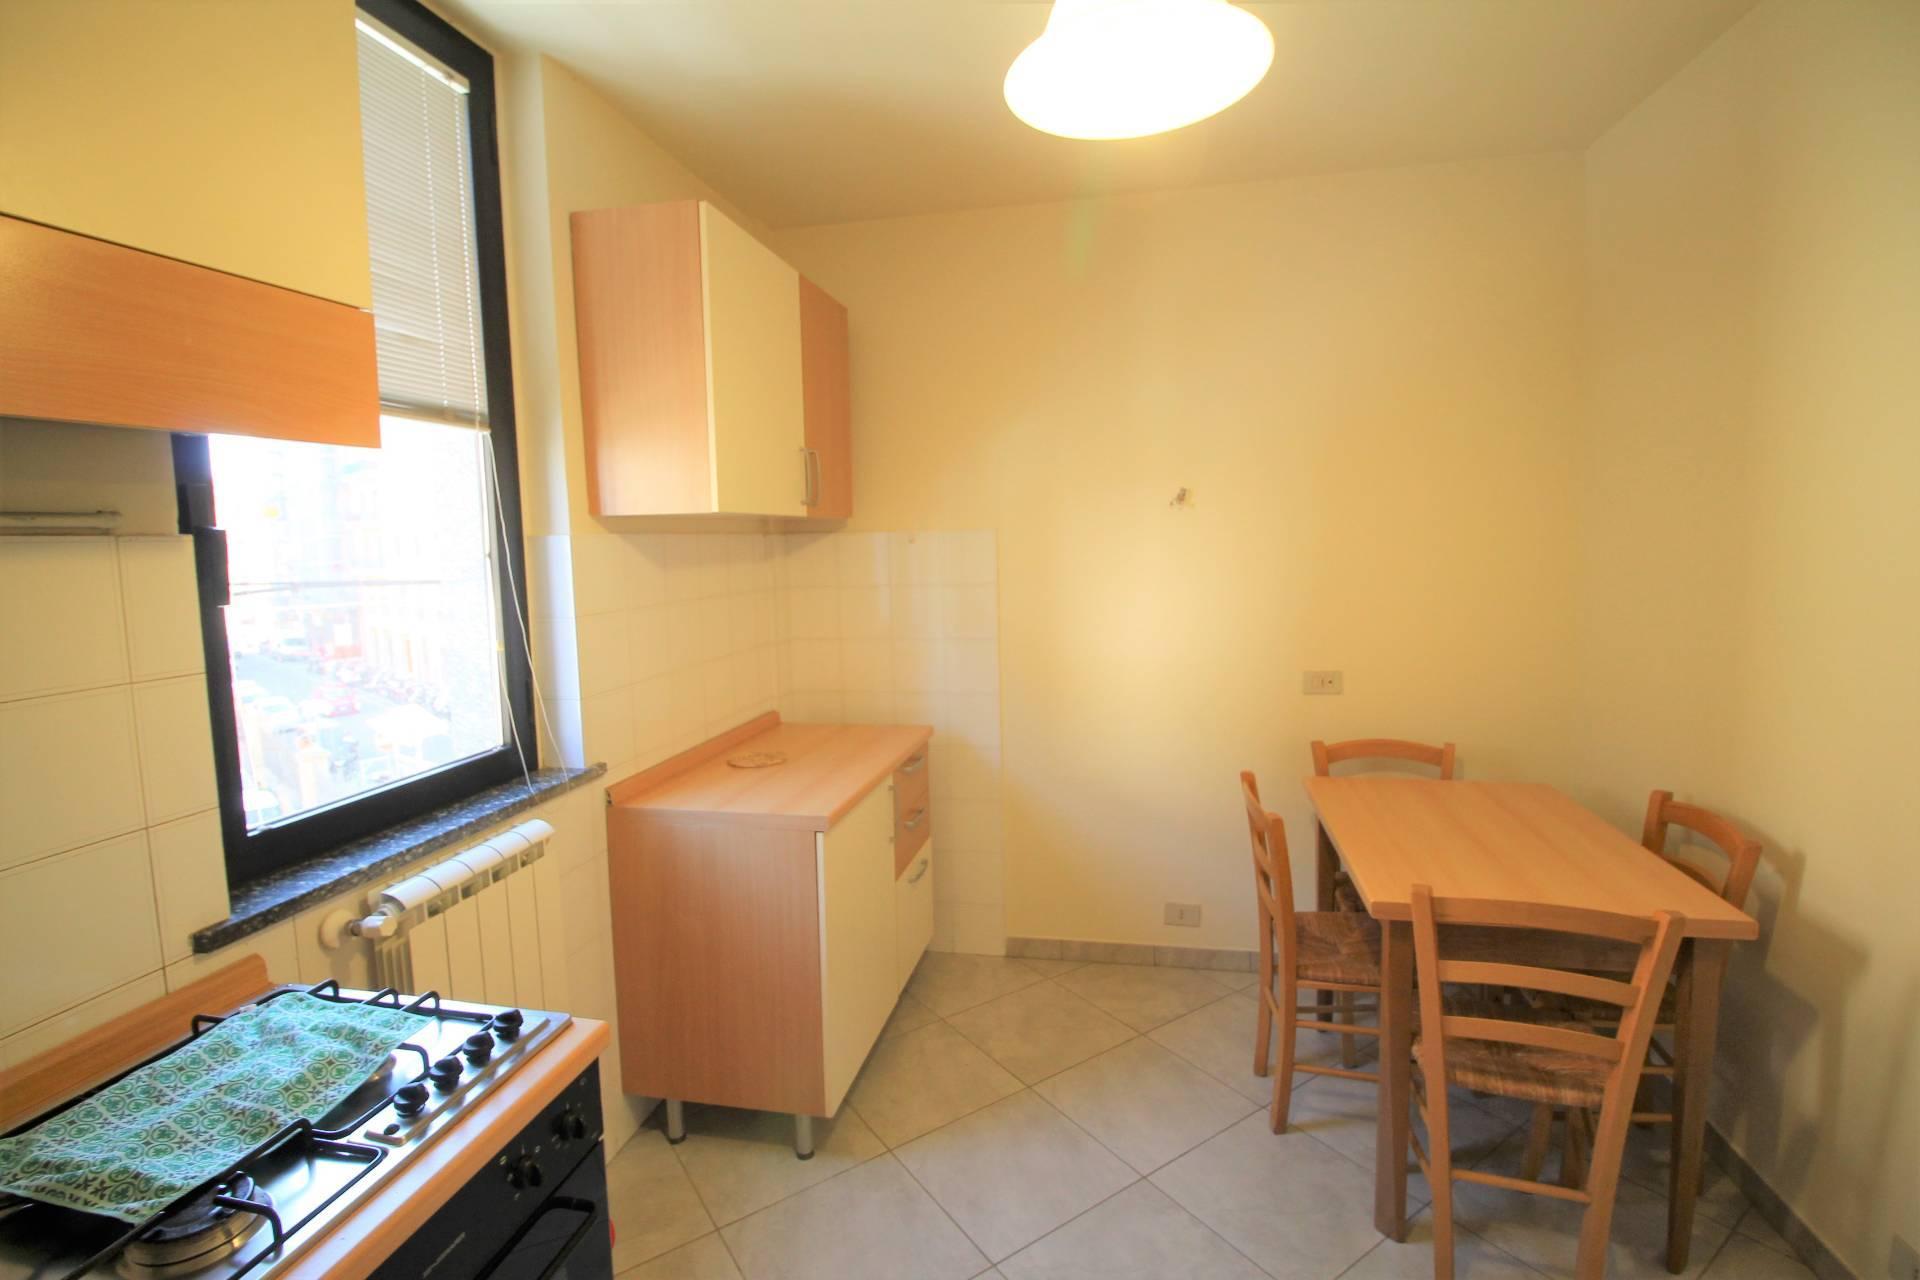 Appartamento in vendita, rif. V2867B